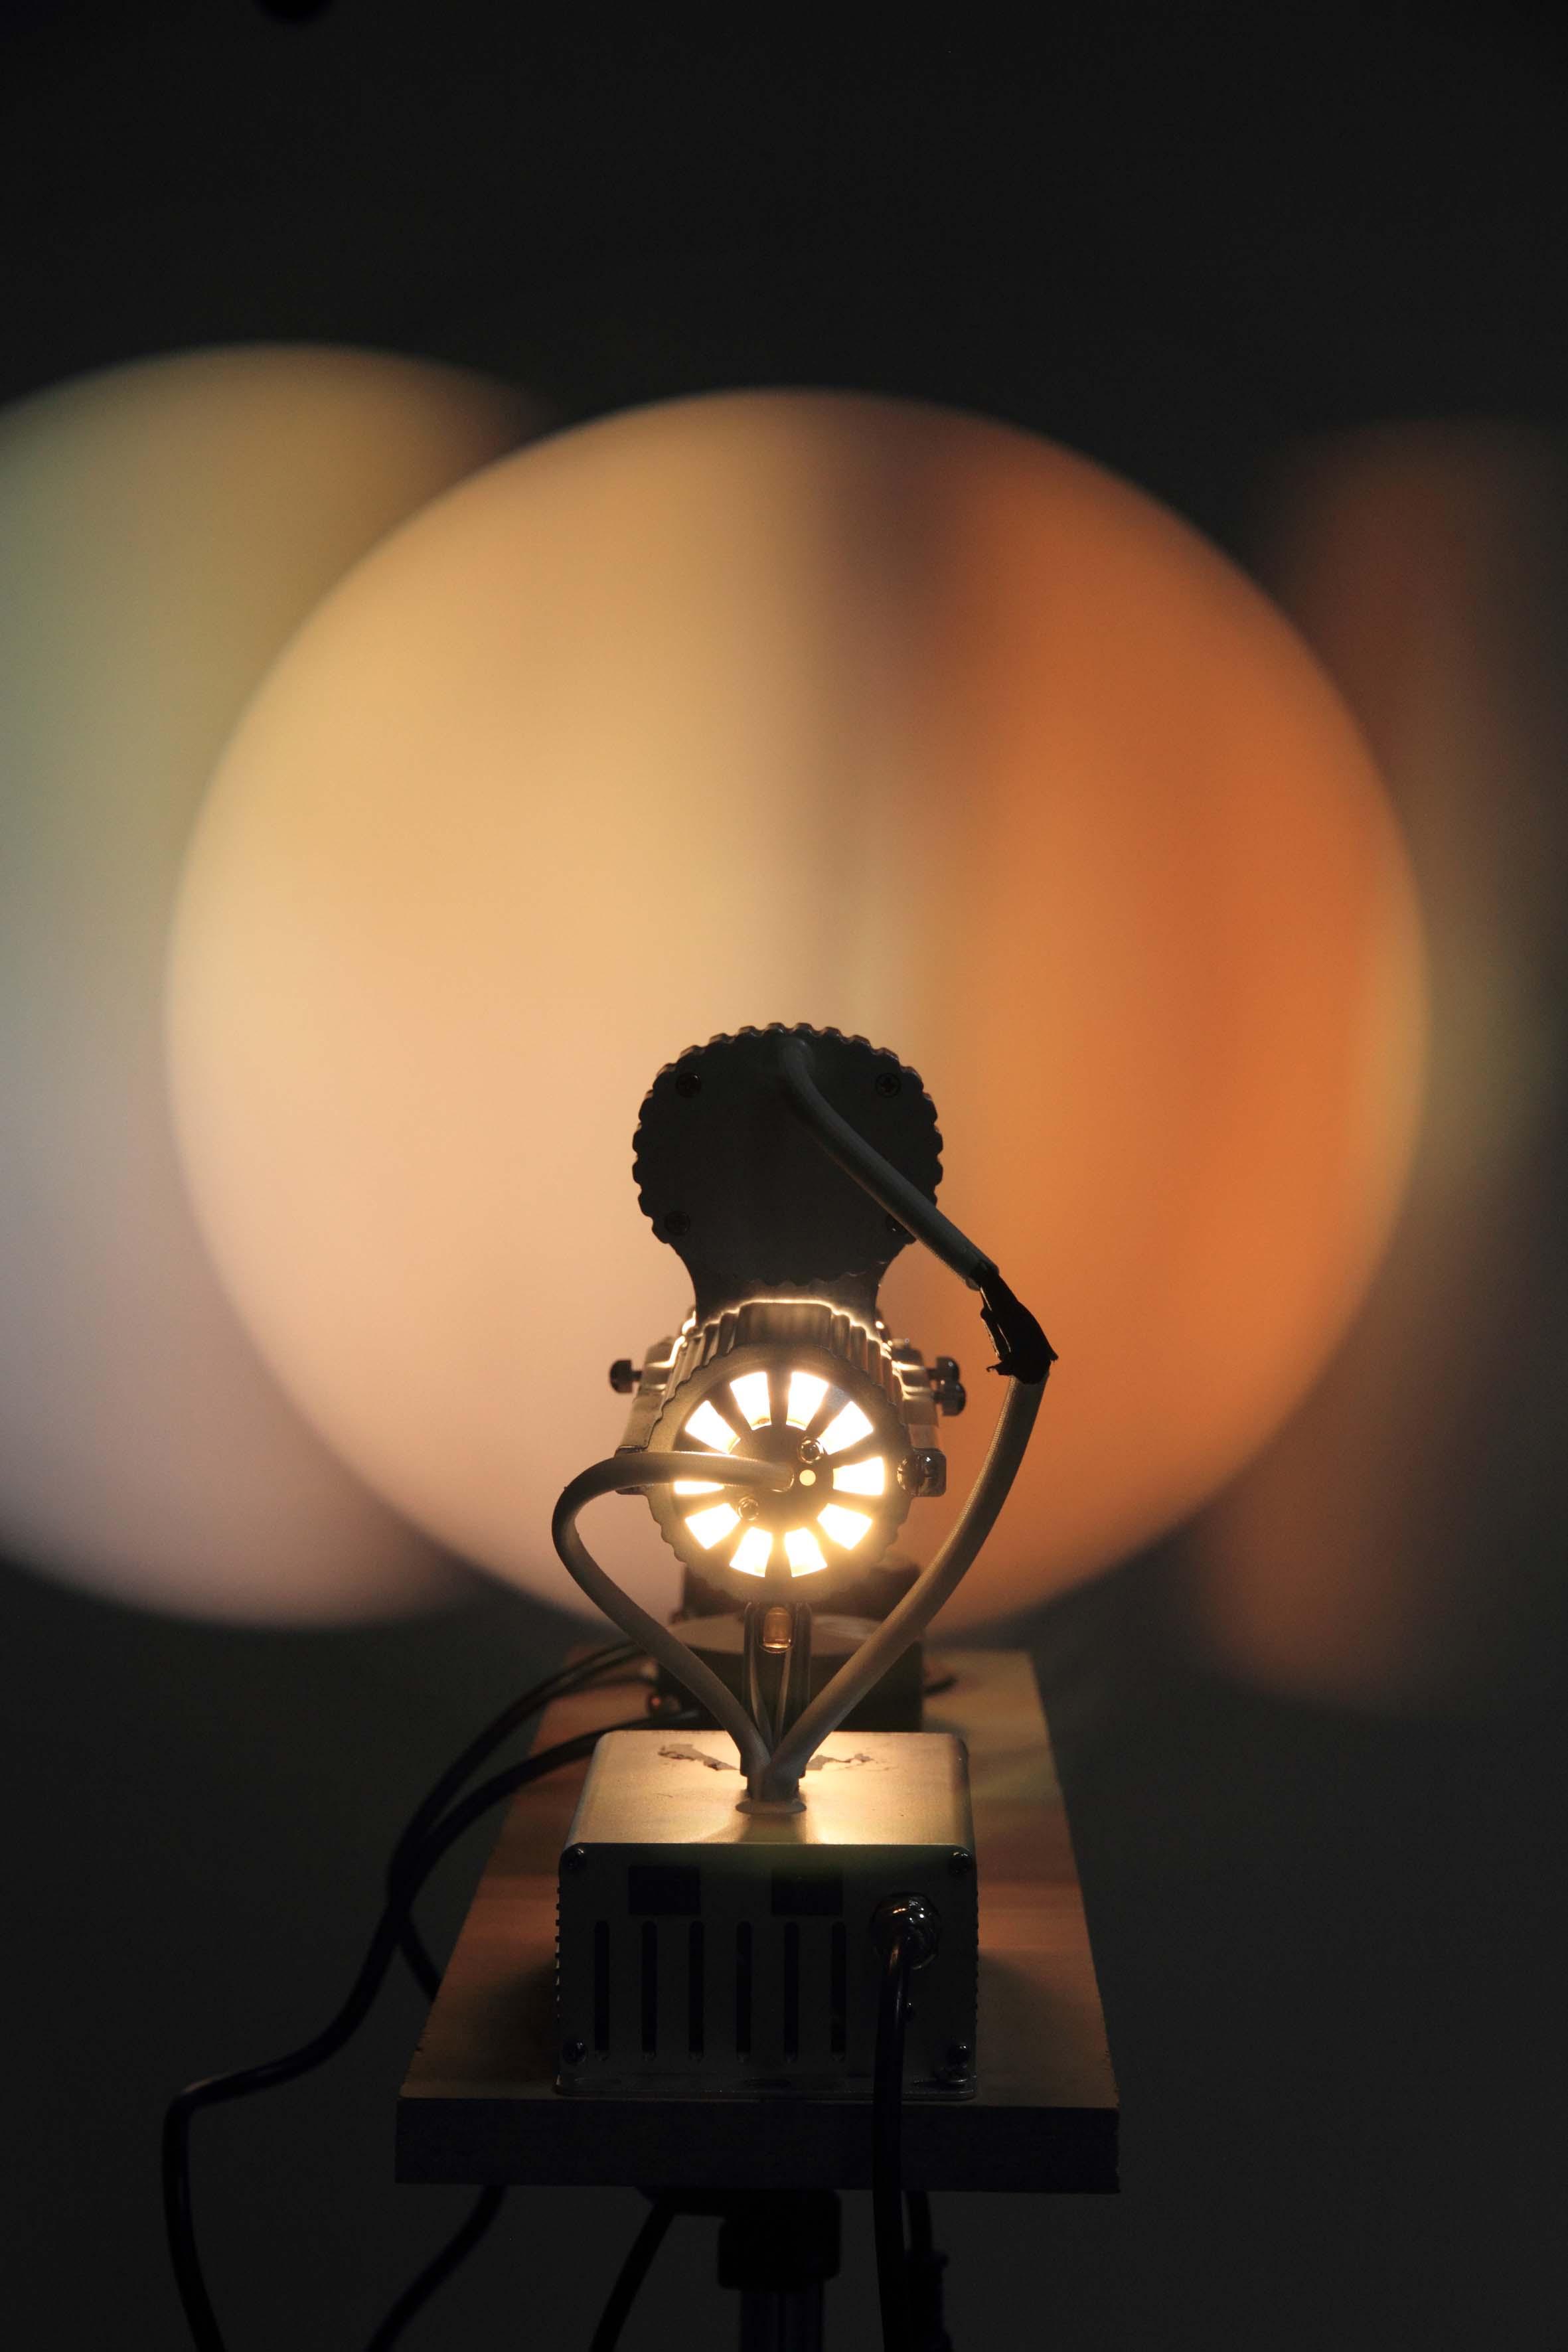 Michaela Gleave, Eclipse Machine (Blue, Red) , 2013, lamp fitting, dichroic glass, mirror ball motors, cedar, lighting stand, 100 x 100 x 140cm